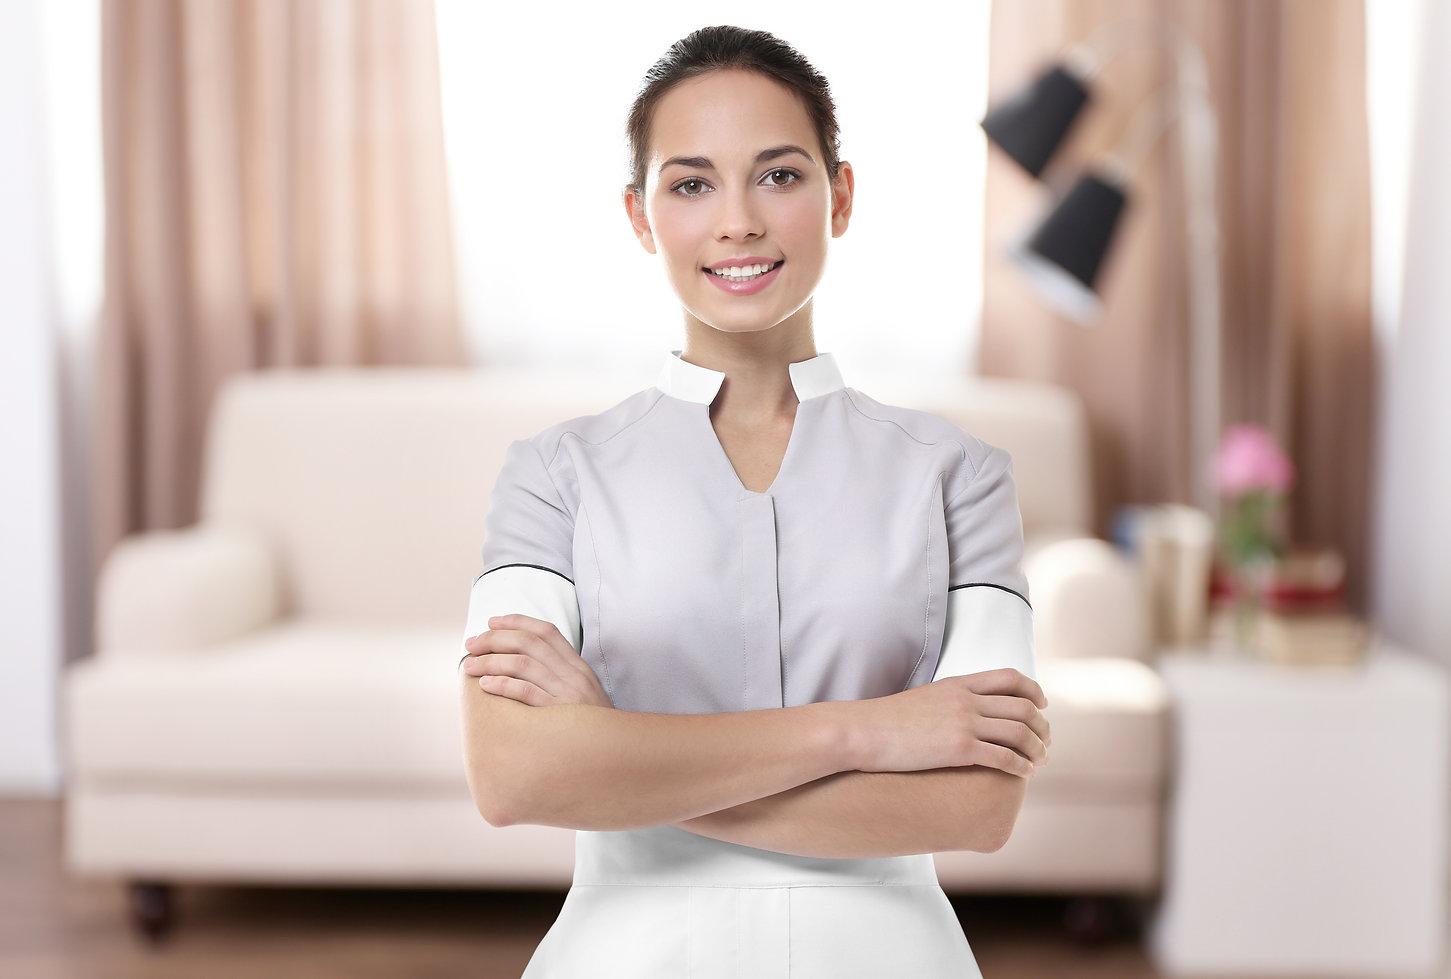 Chambermaid standing on living room back